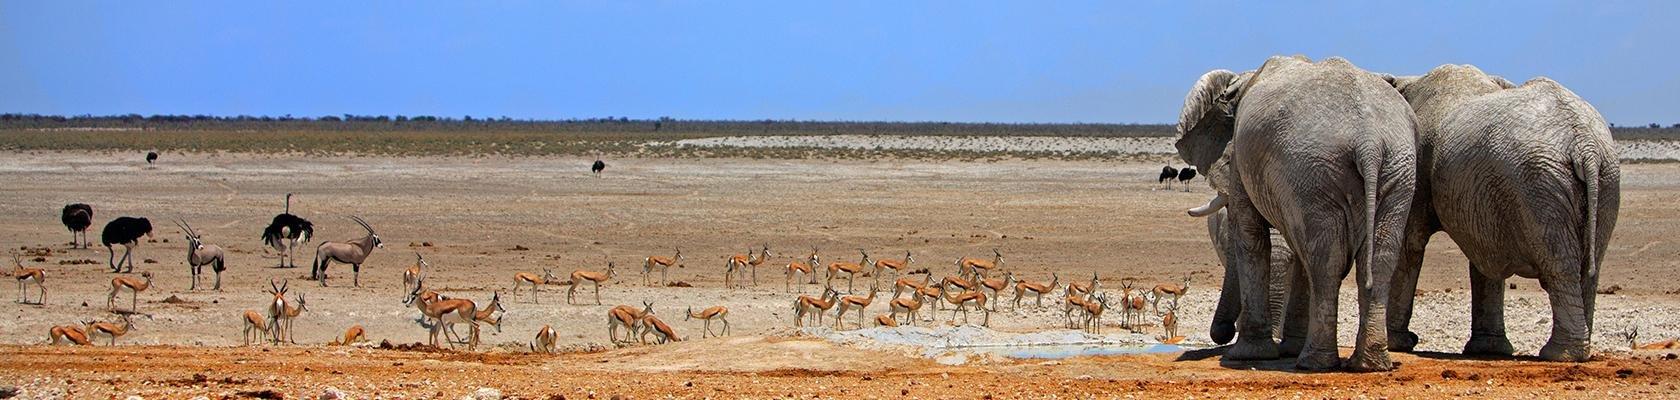 Etosha Nationaal Park (Namibië)